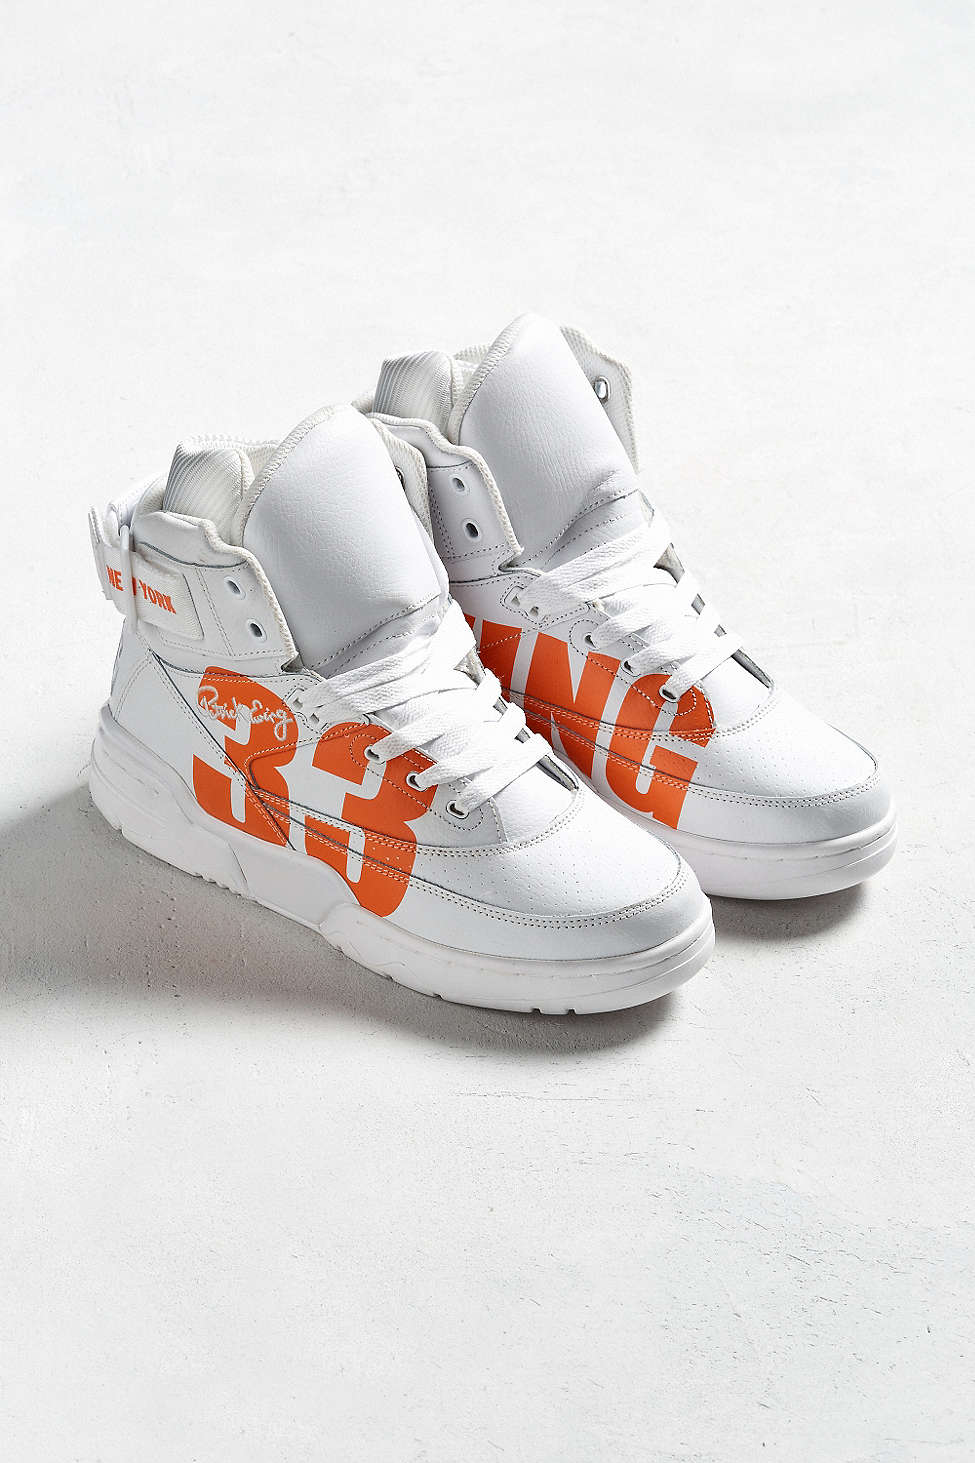 urban outfitters x ewing 33 hi NYC white orange 2